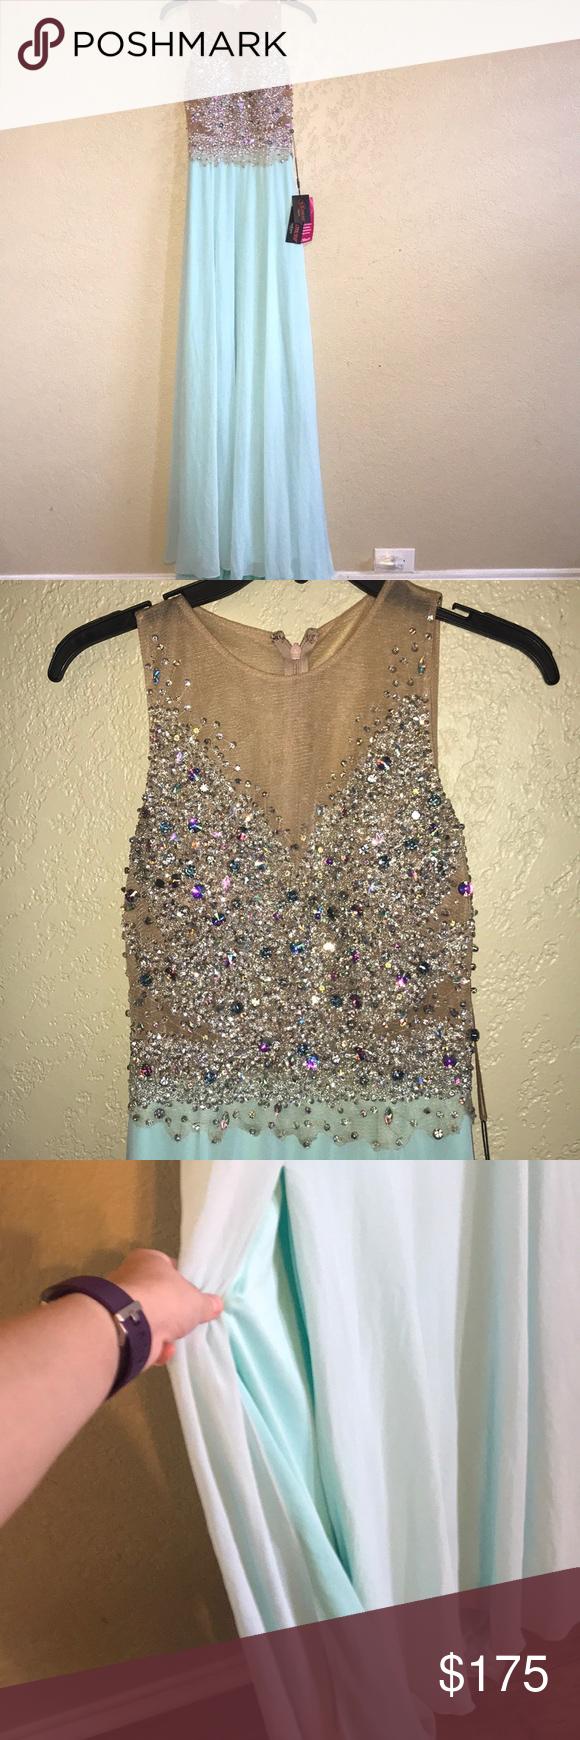 Nwt light aquamarine prom dress w rhinestones nwt my posh